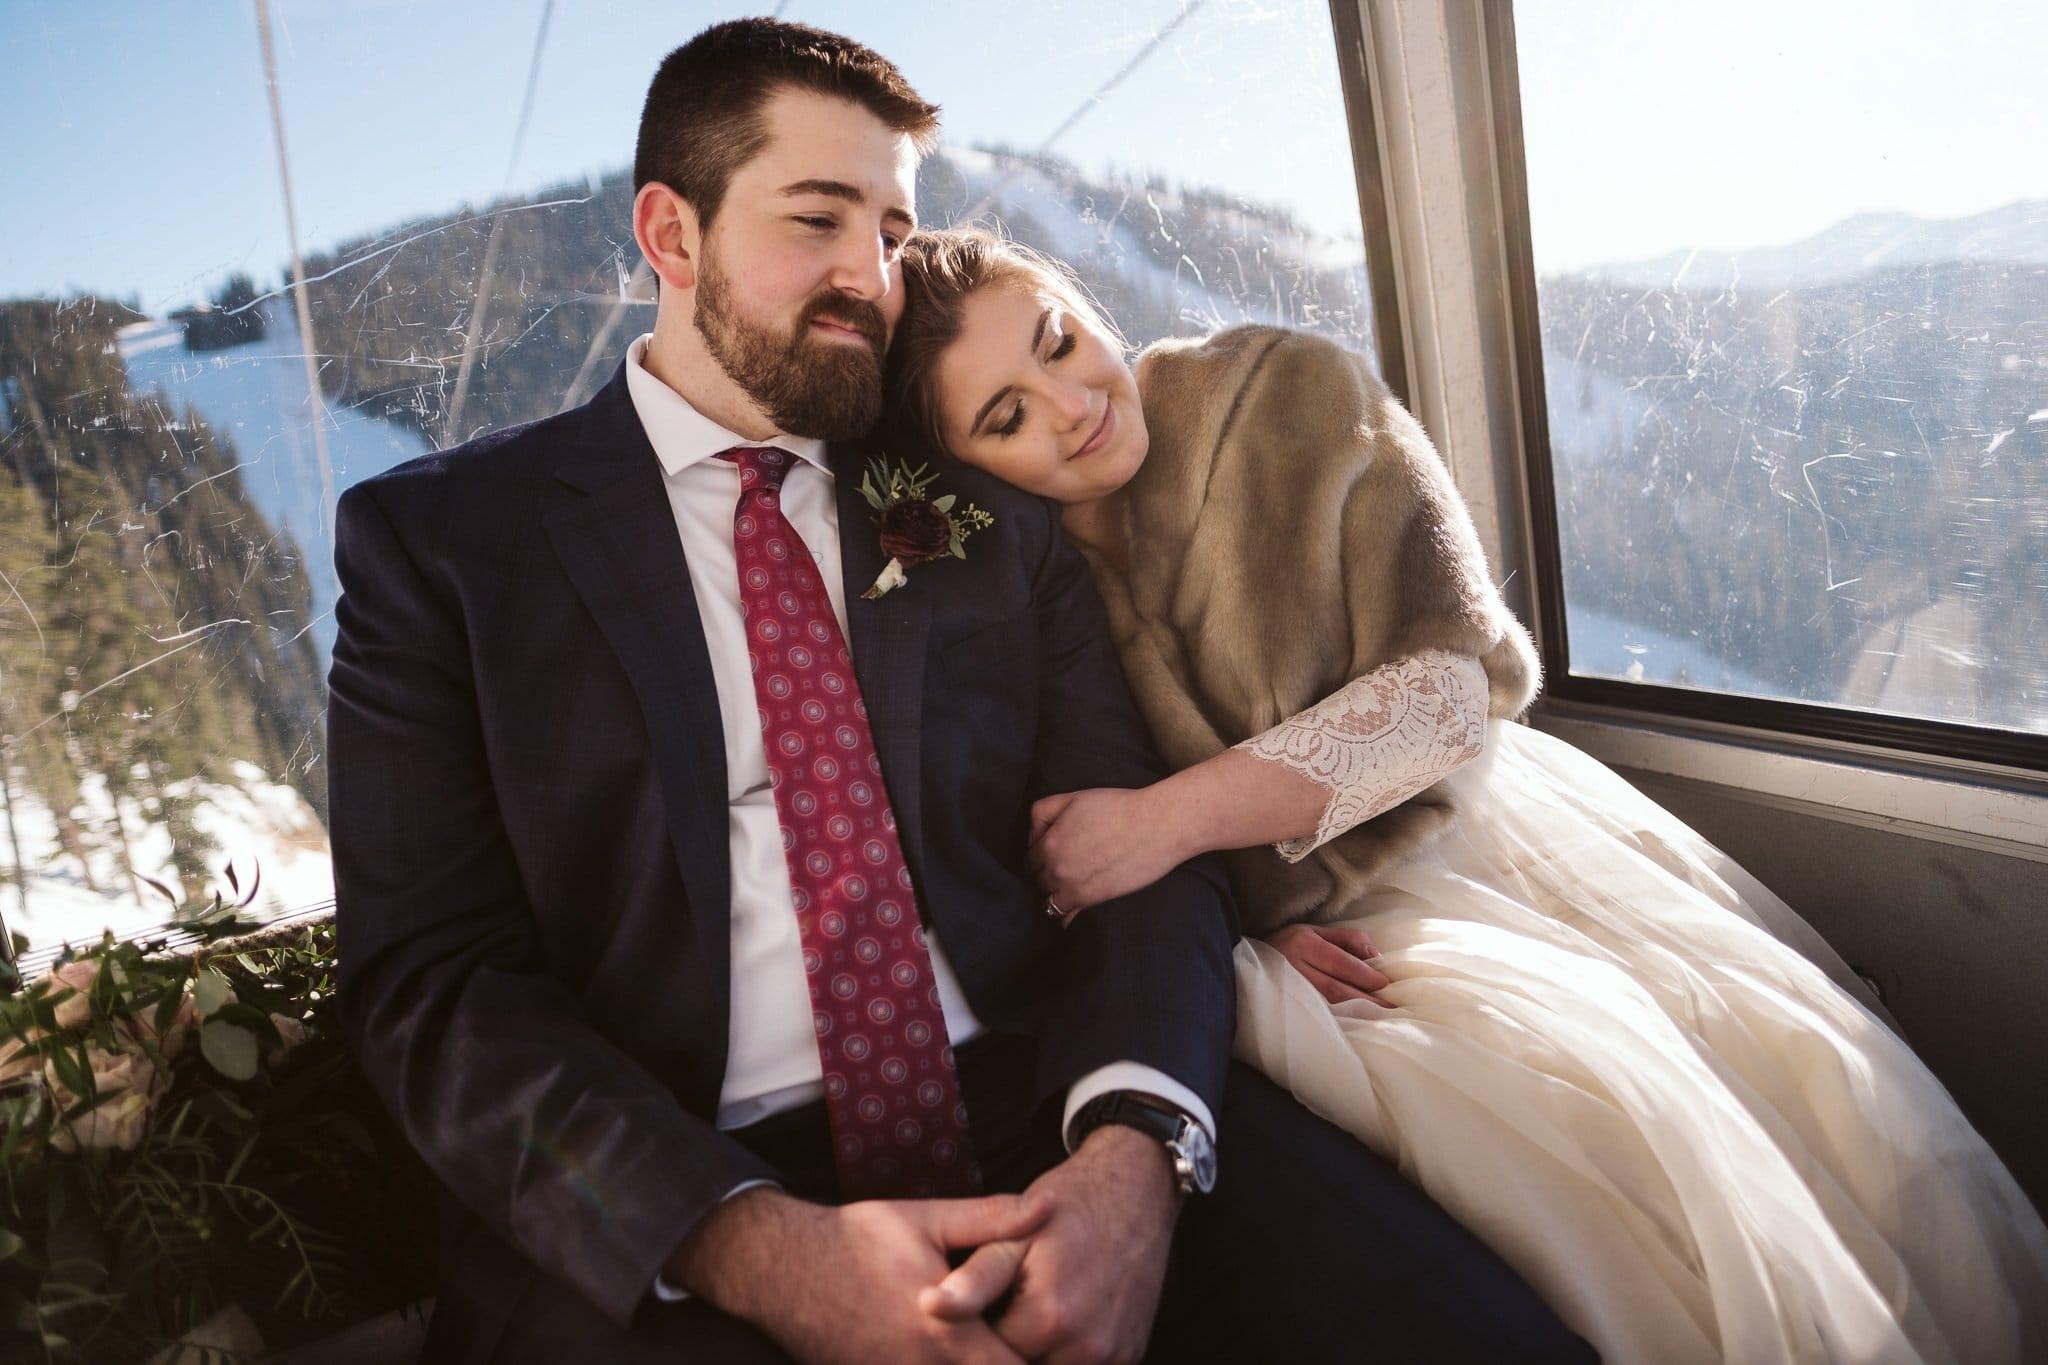 Bride and groom ride gondola at Keystone Ski Resort in Colorado for their winter wedding.